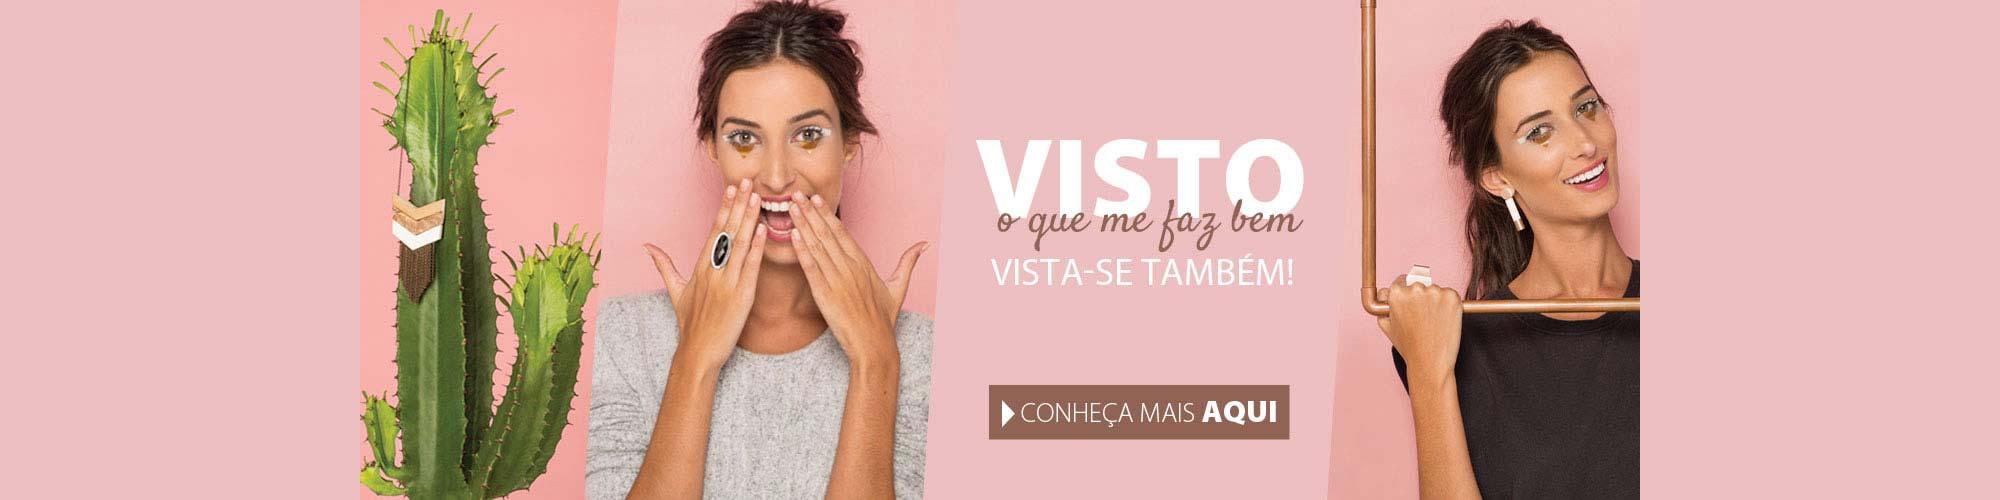 Banner Visto03